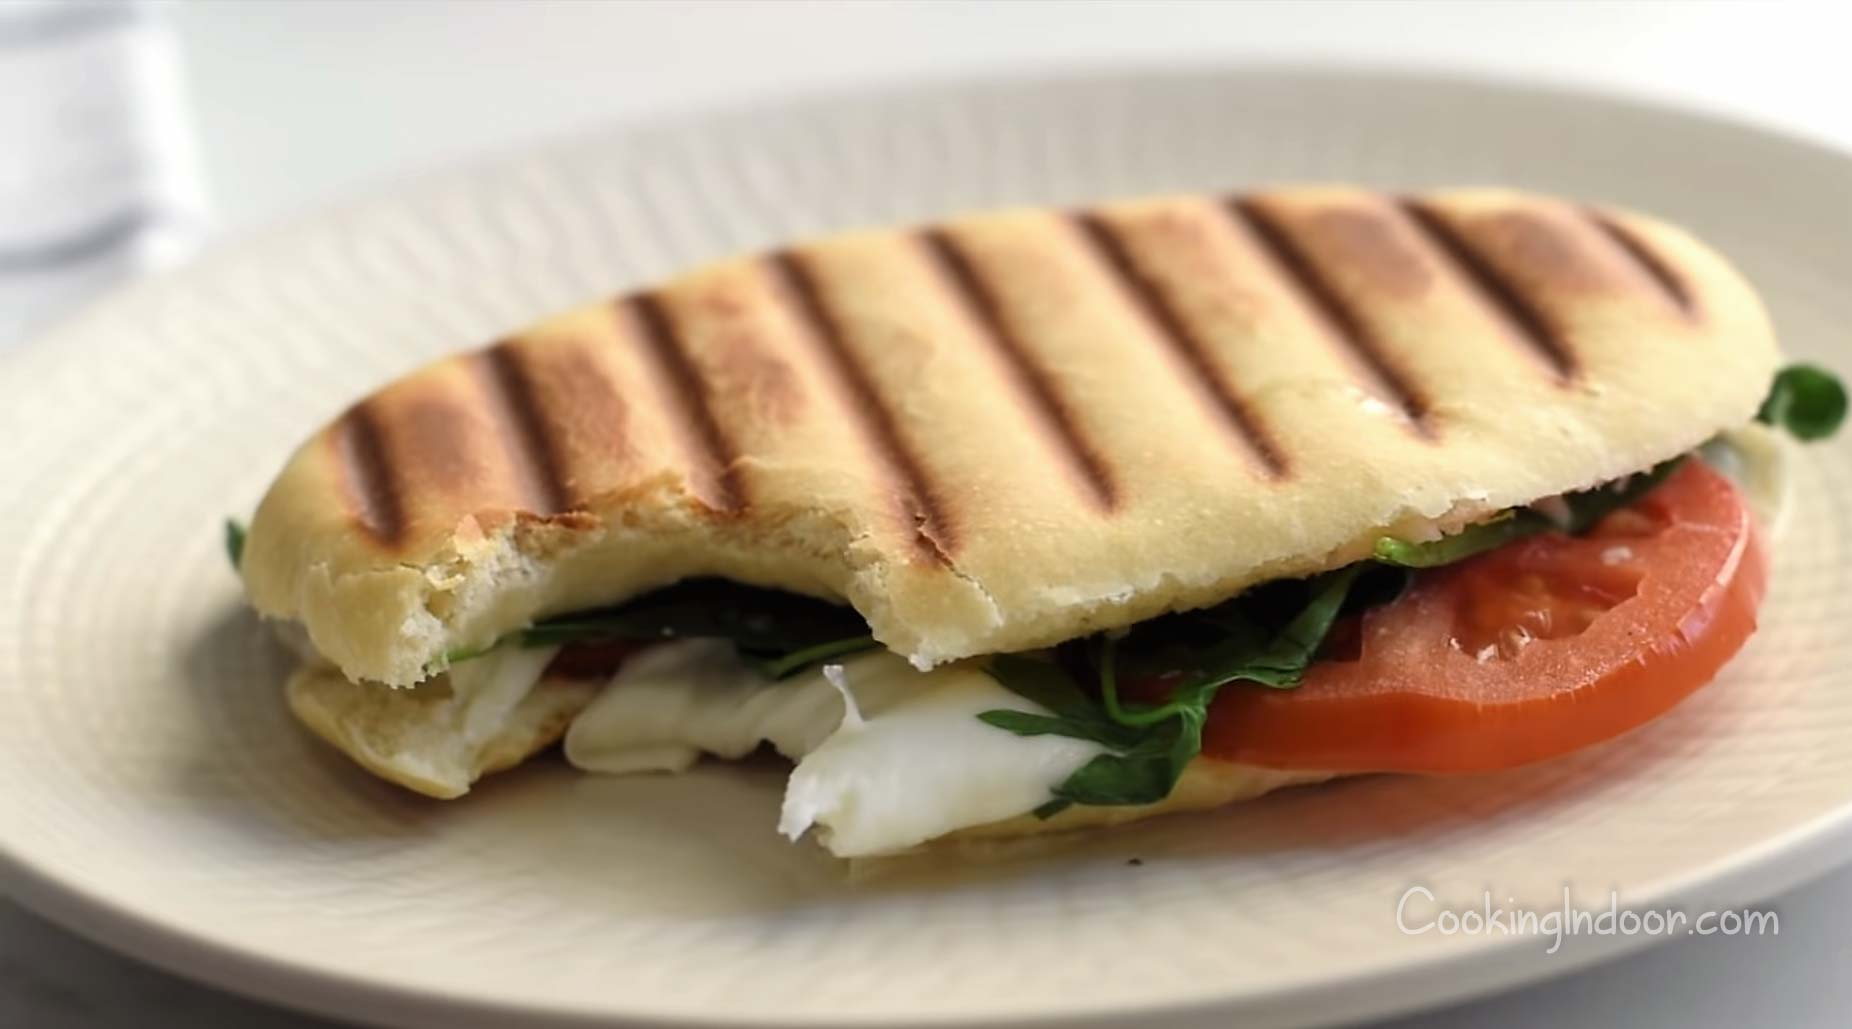 Best panini bread maker